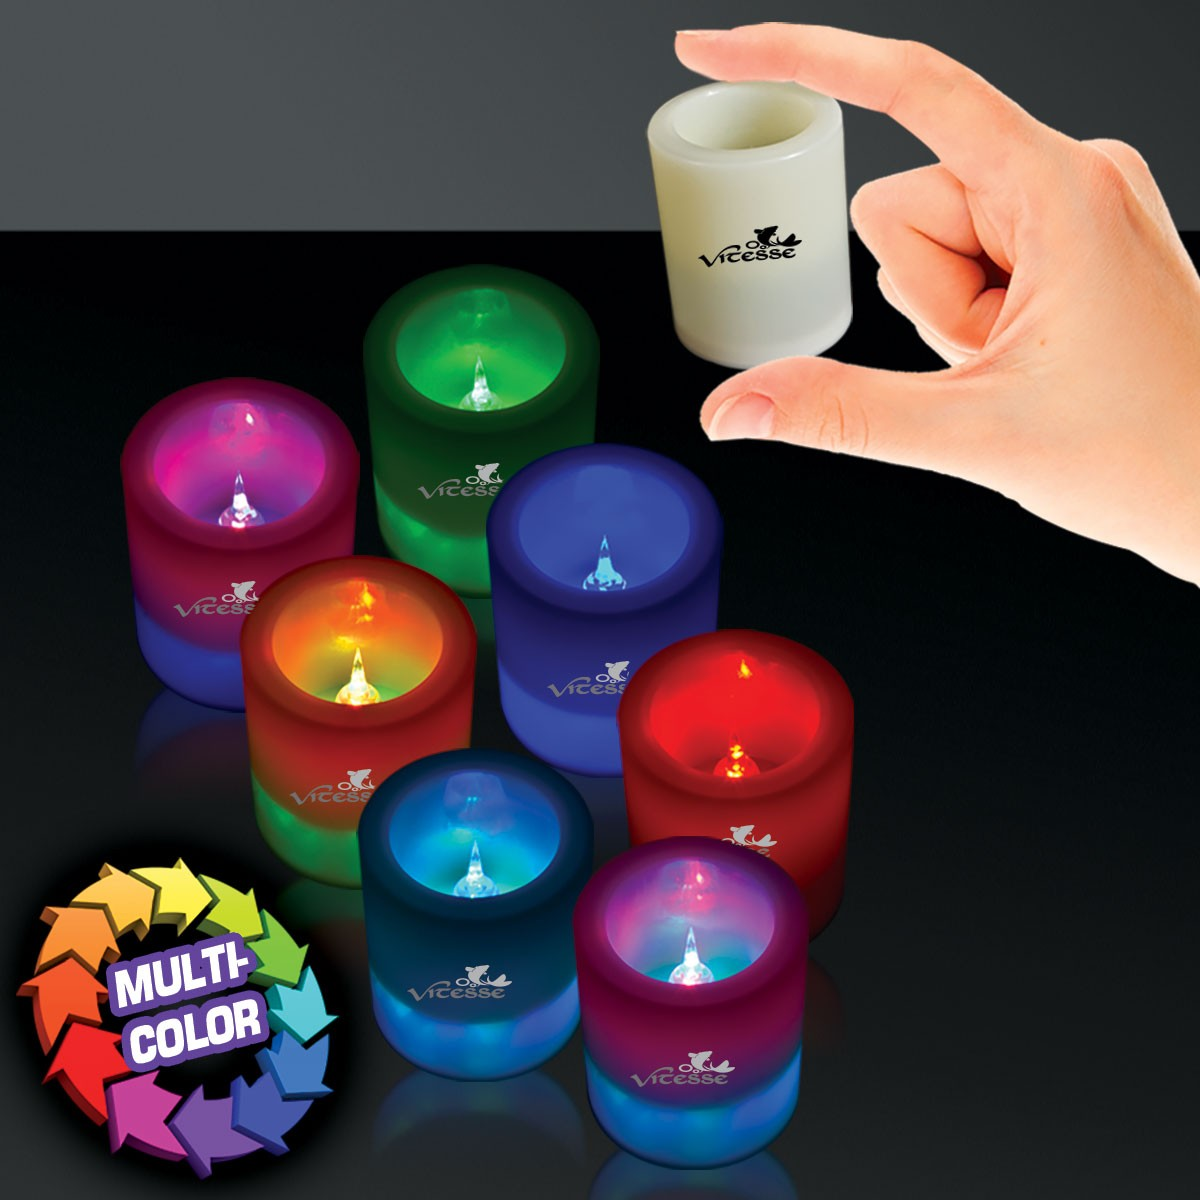 7 Color LED Votive Candle - 2 1/2 Inch